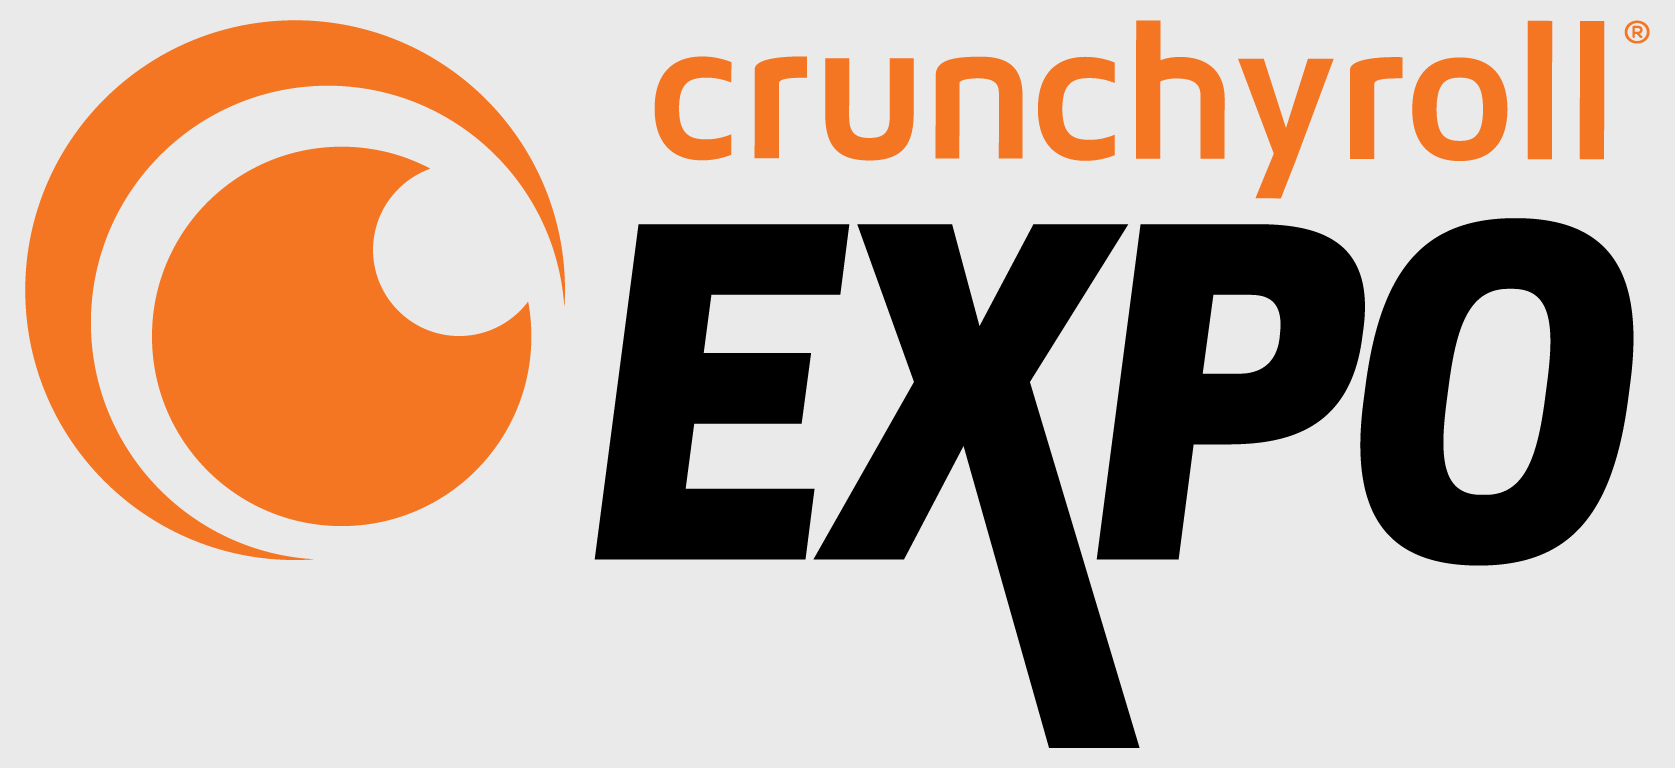 Crunchyroll Expo logo